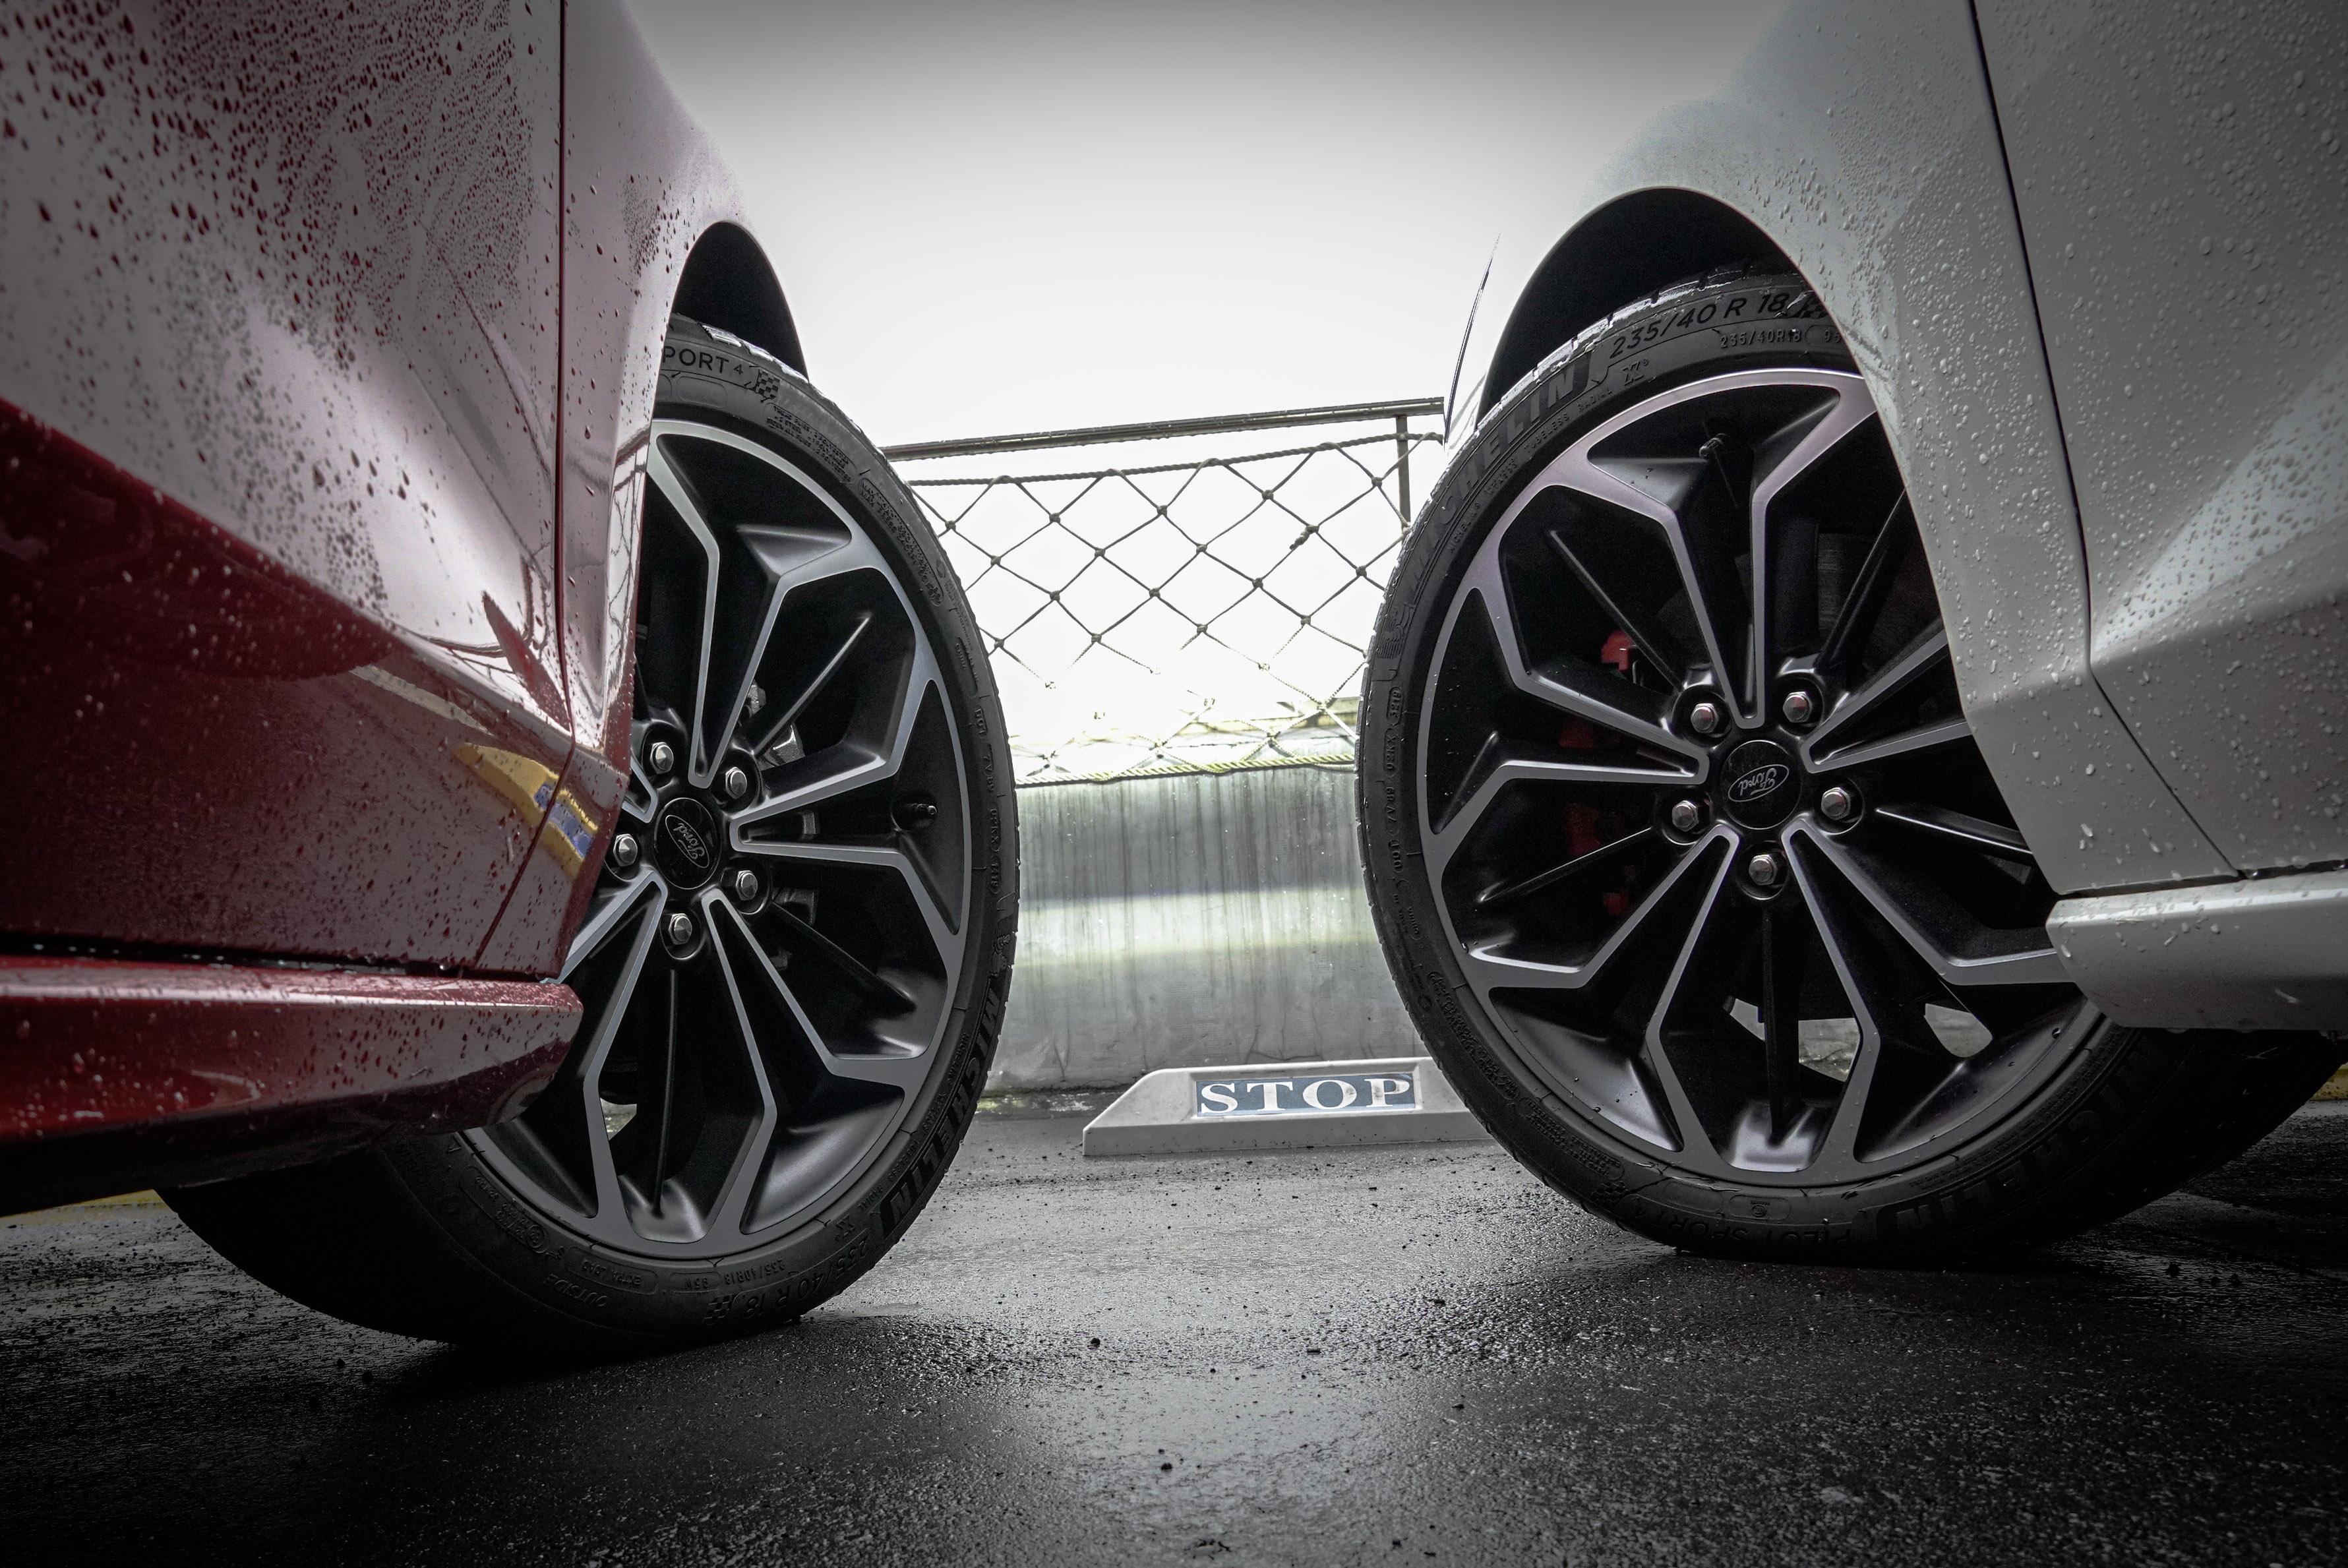 Lommel 使用賽道級煞車系統,包含紅色卡鉗、加大前/後碟盤(308/302mm)。